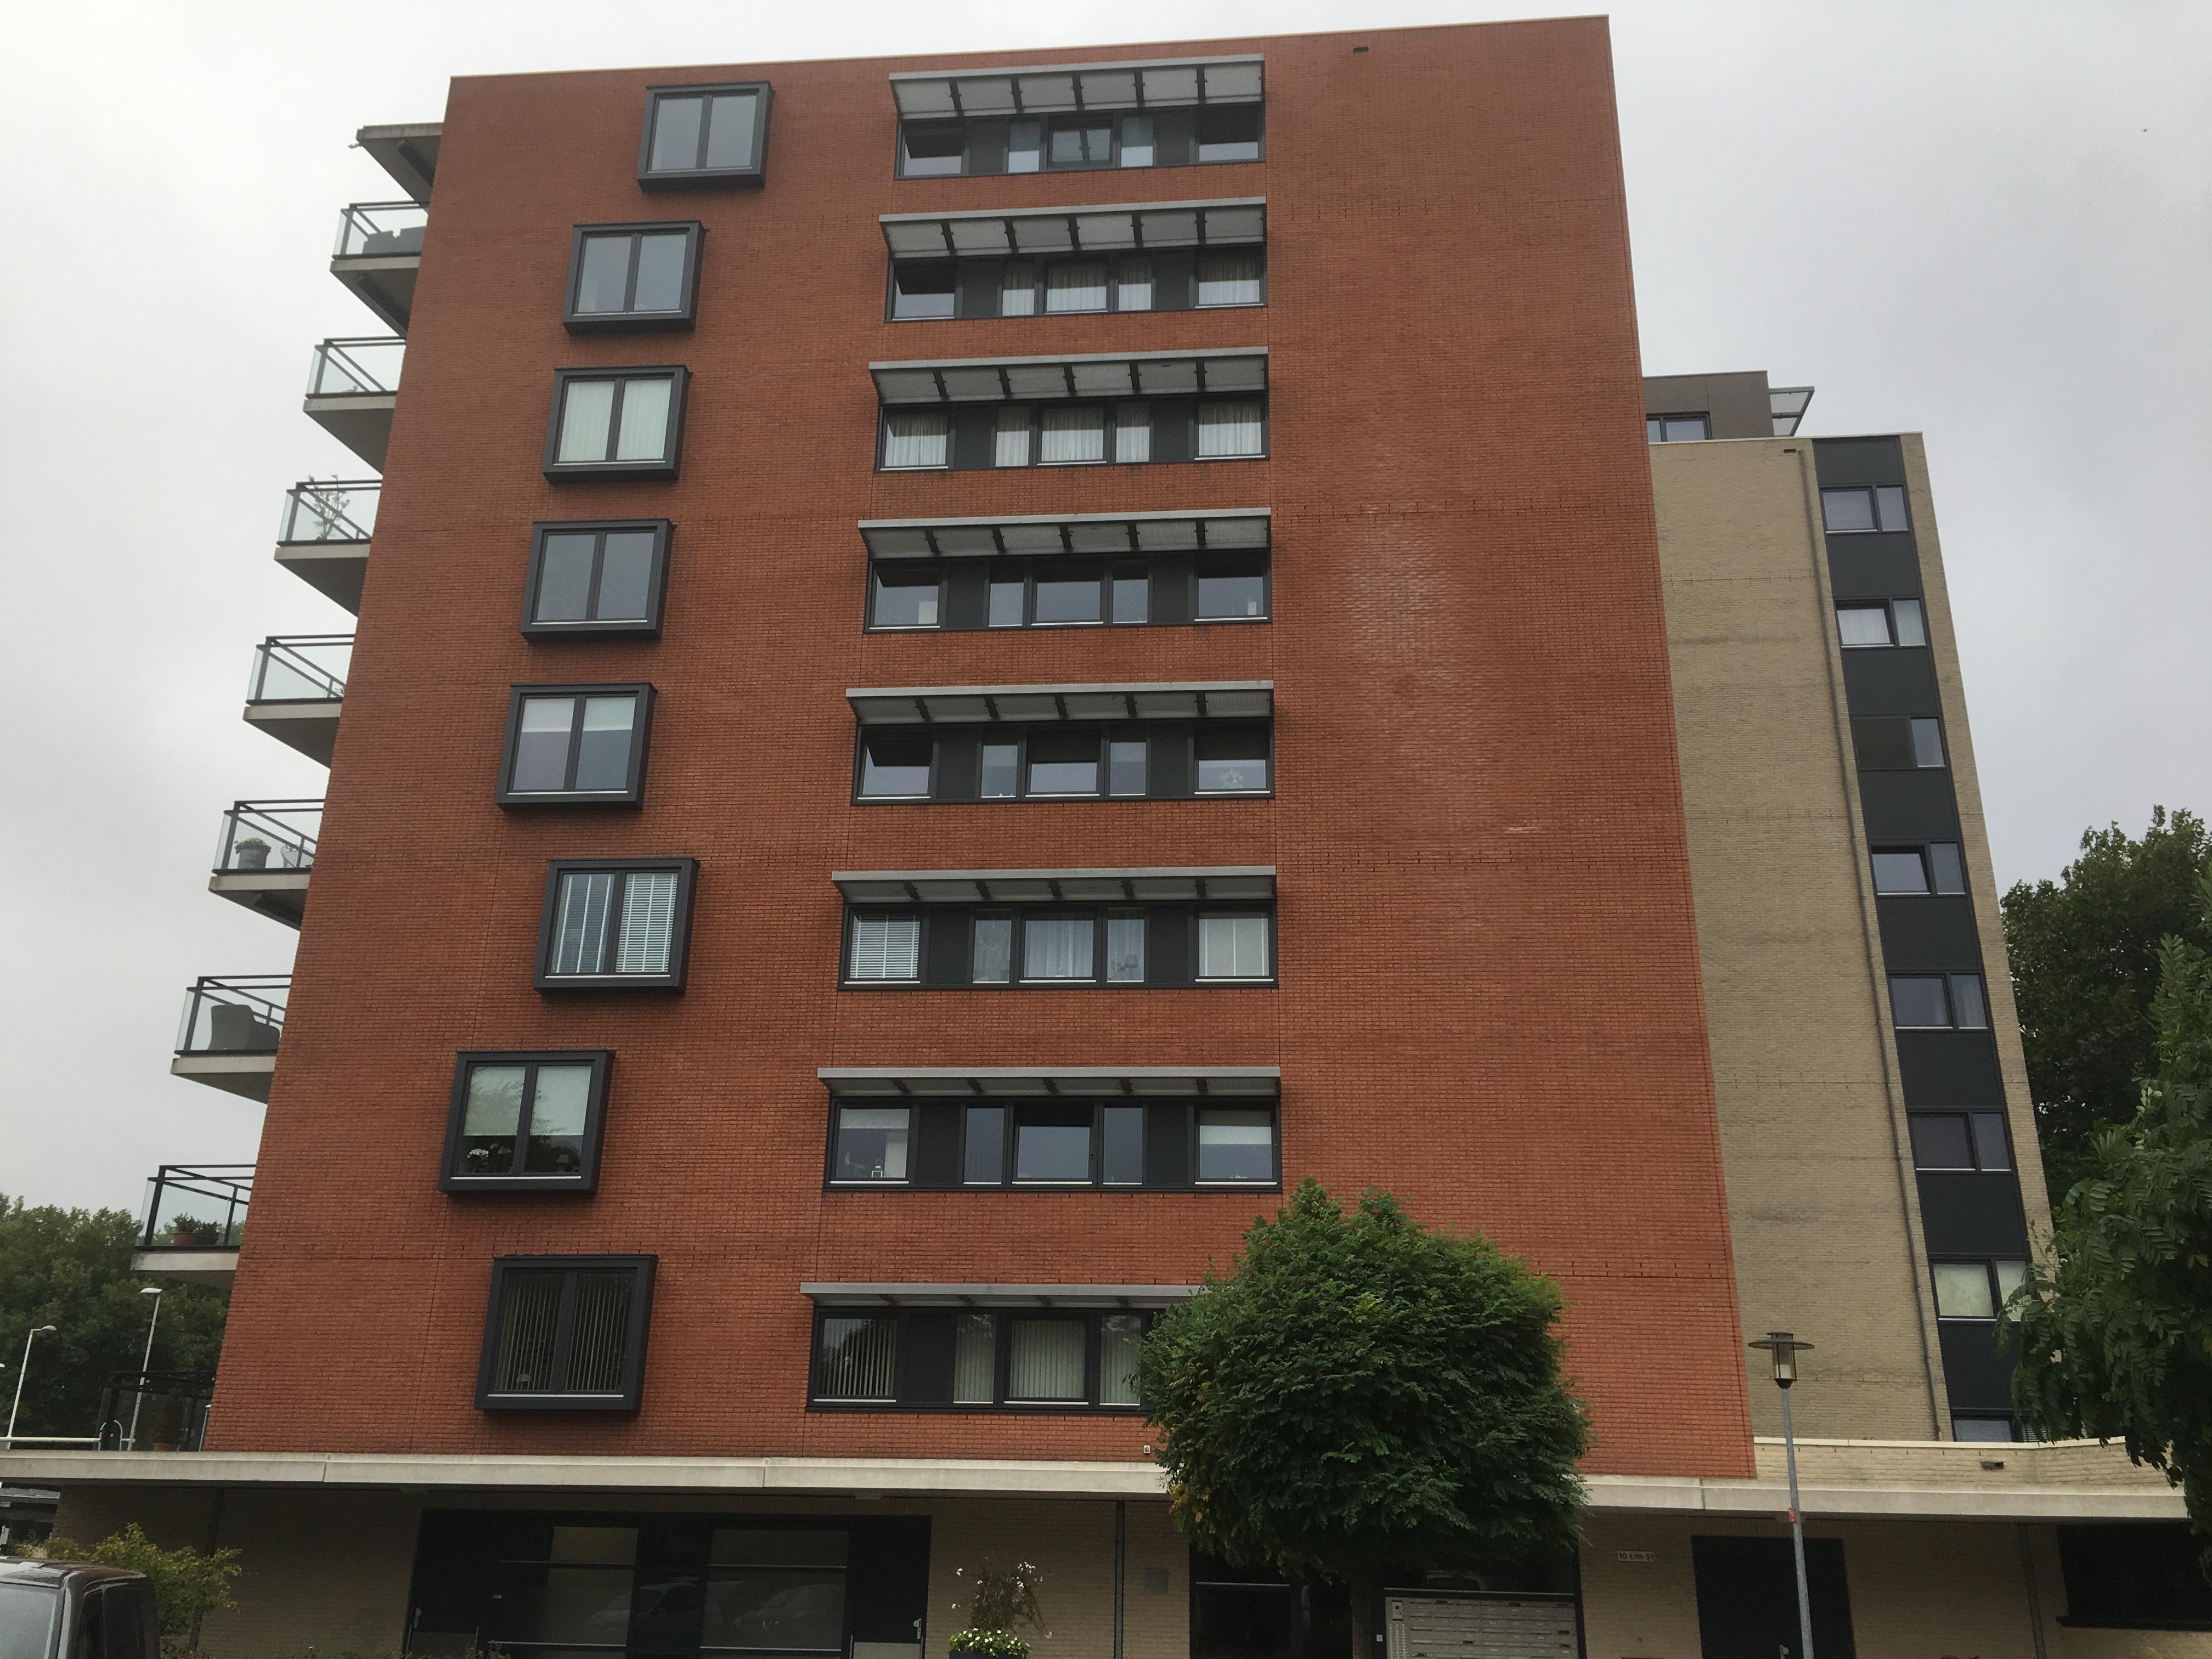 Onderhoudsplan appartementencomplex Rotterdam IJsselmonde